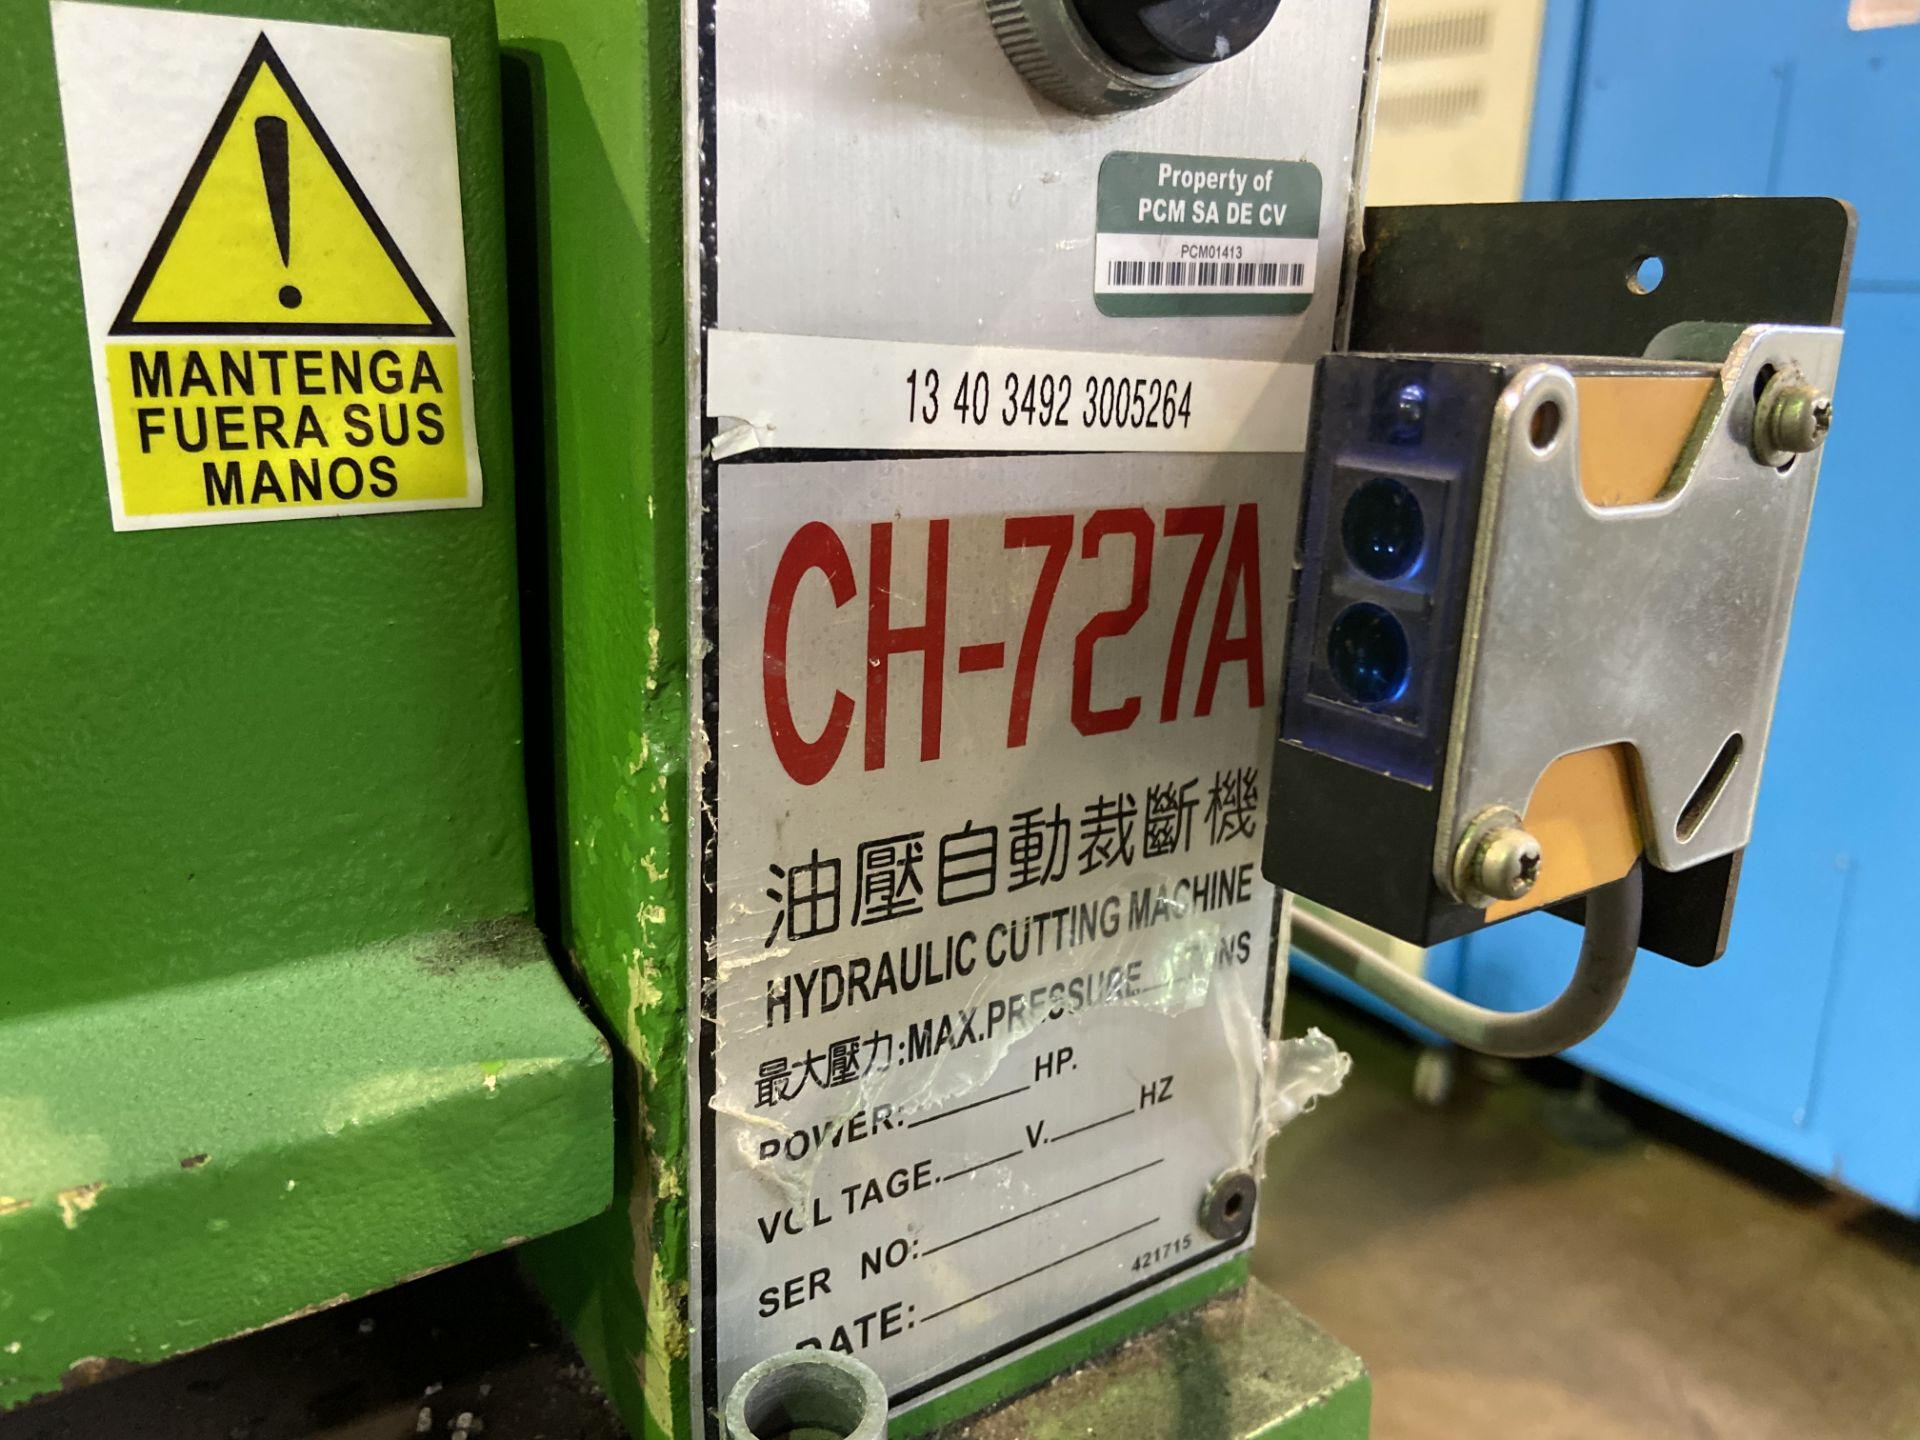 Lot 6 - (2) Prensas de corte hidráulica plana, marca Hydraulic Cutting Machine, Modelo: CH-727A.